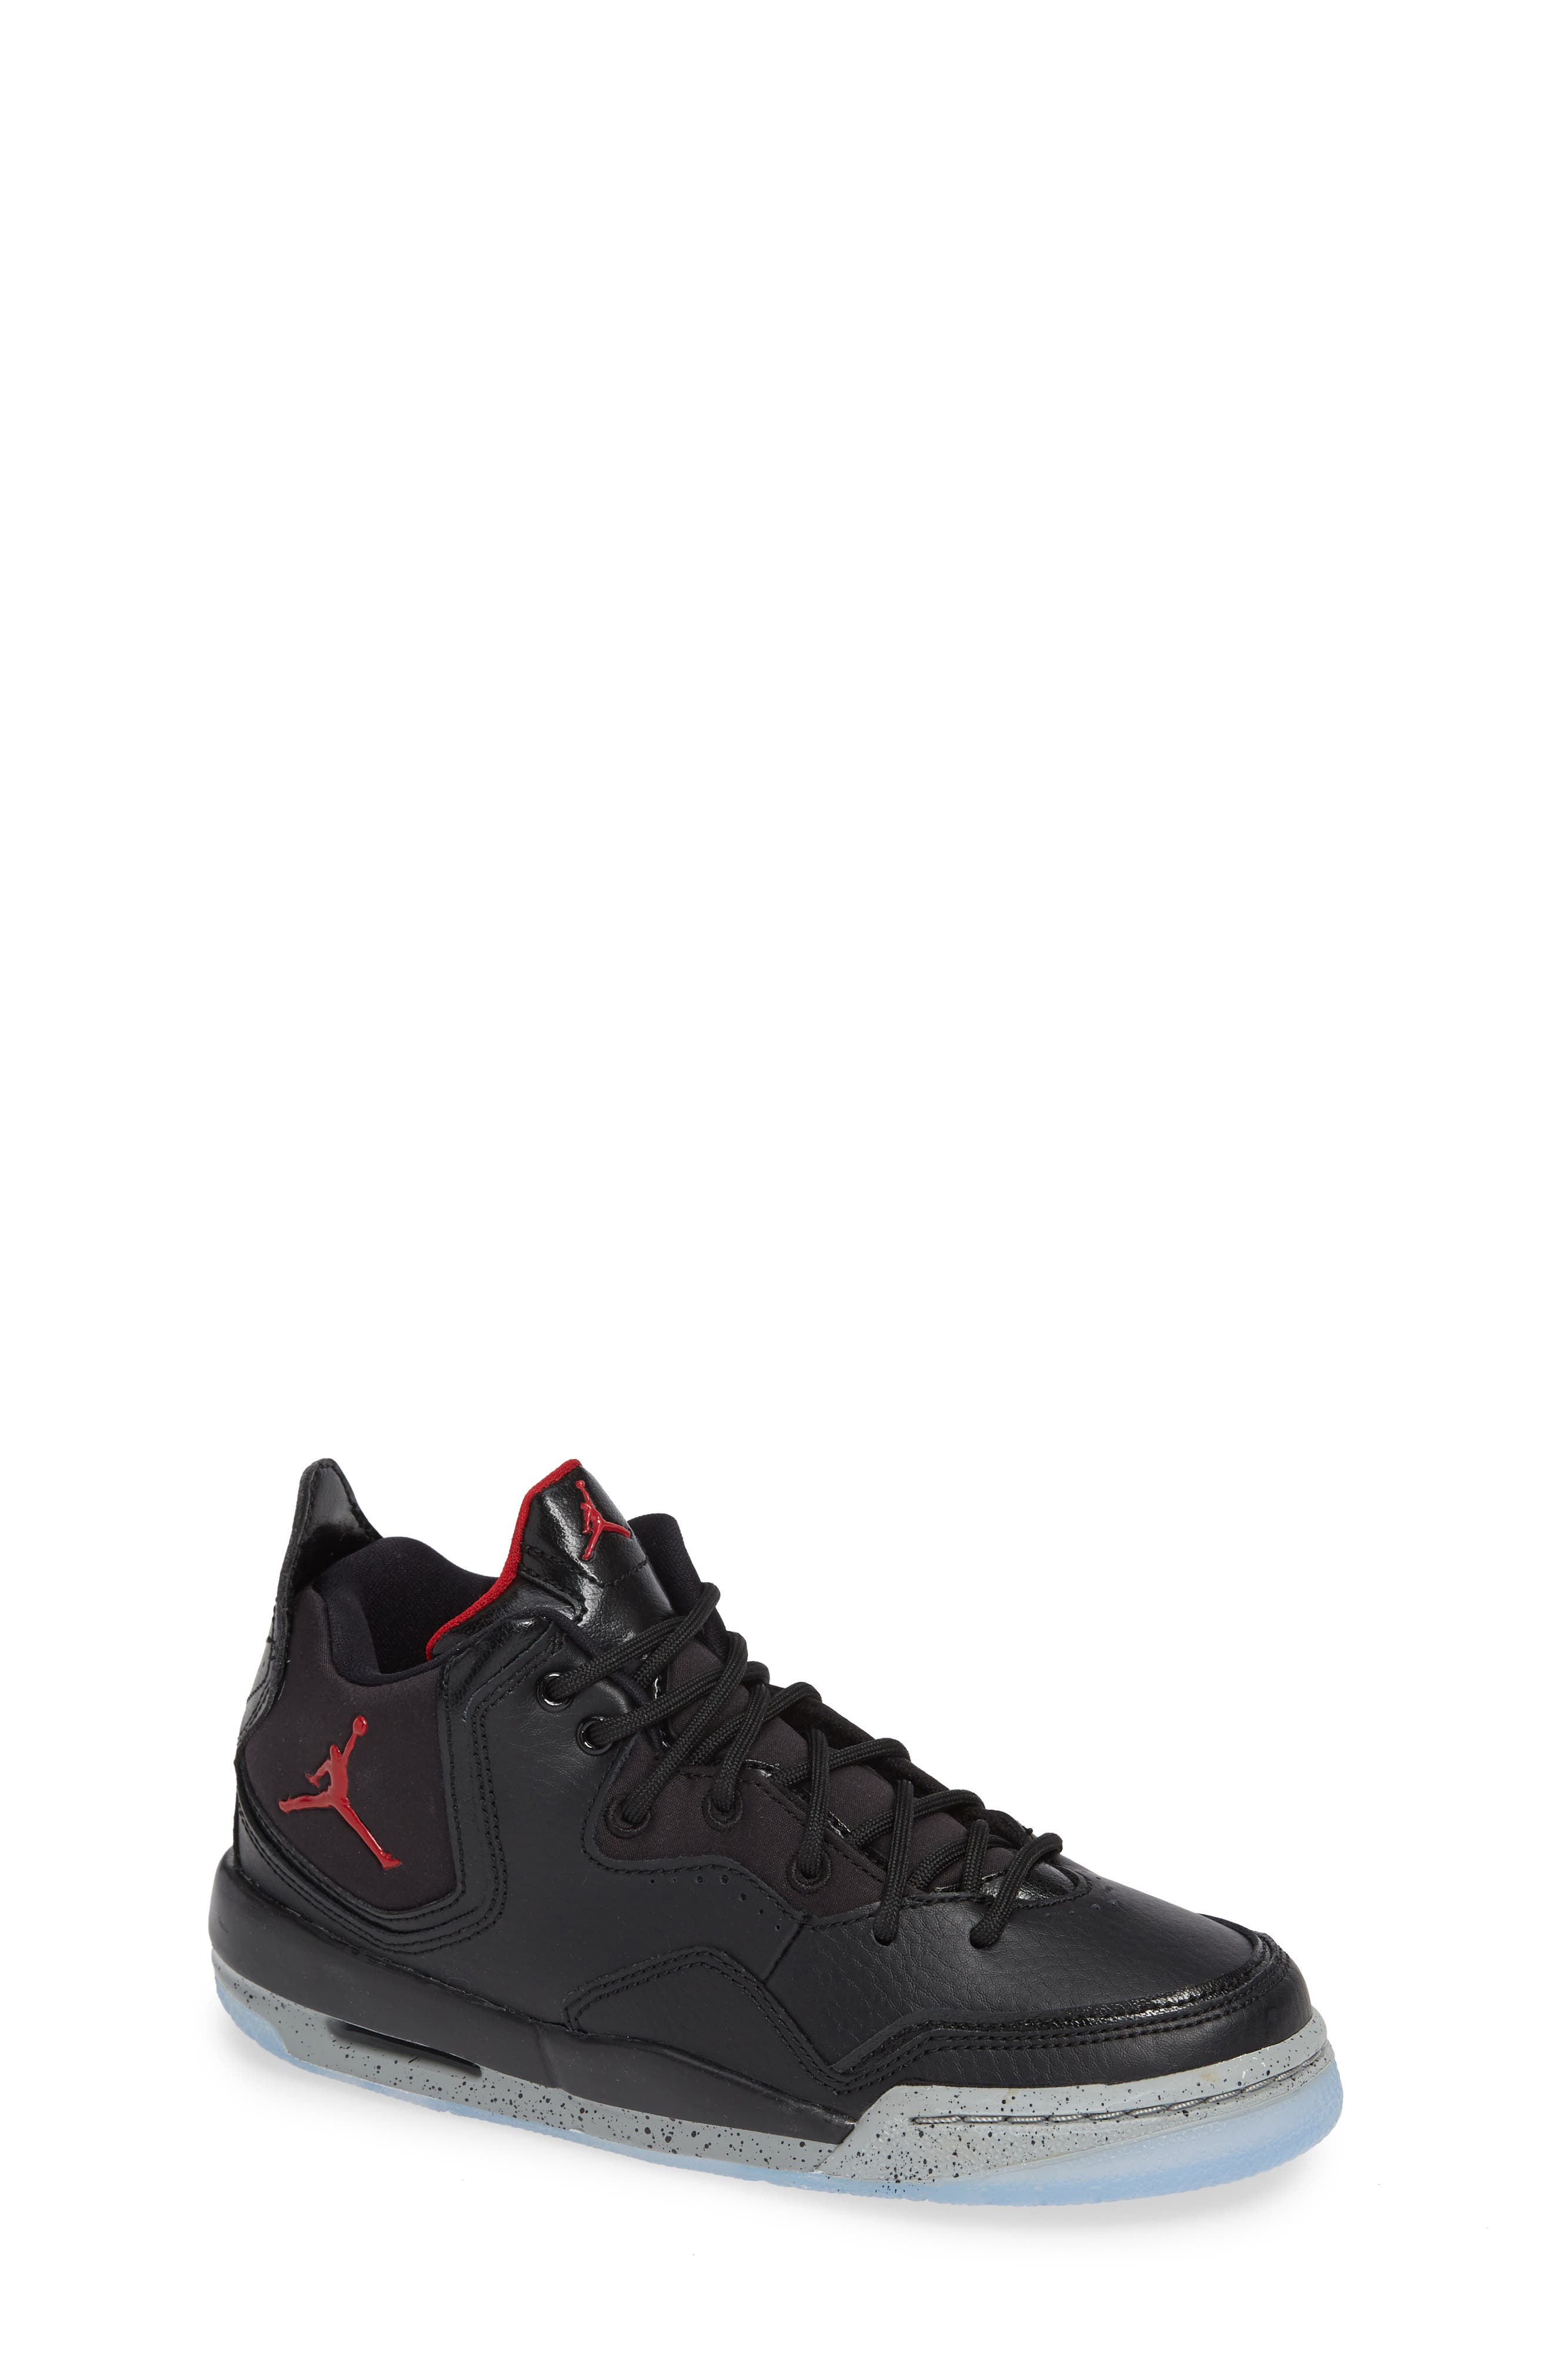 Nike Air Jordan Courtside 23 Sneaker